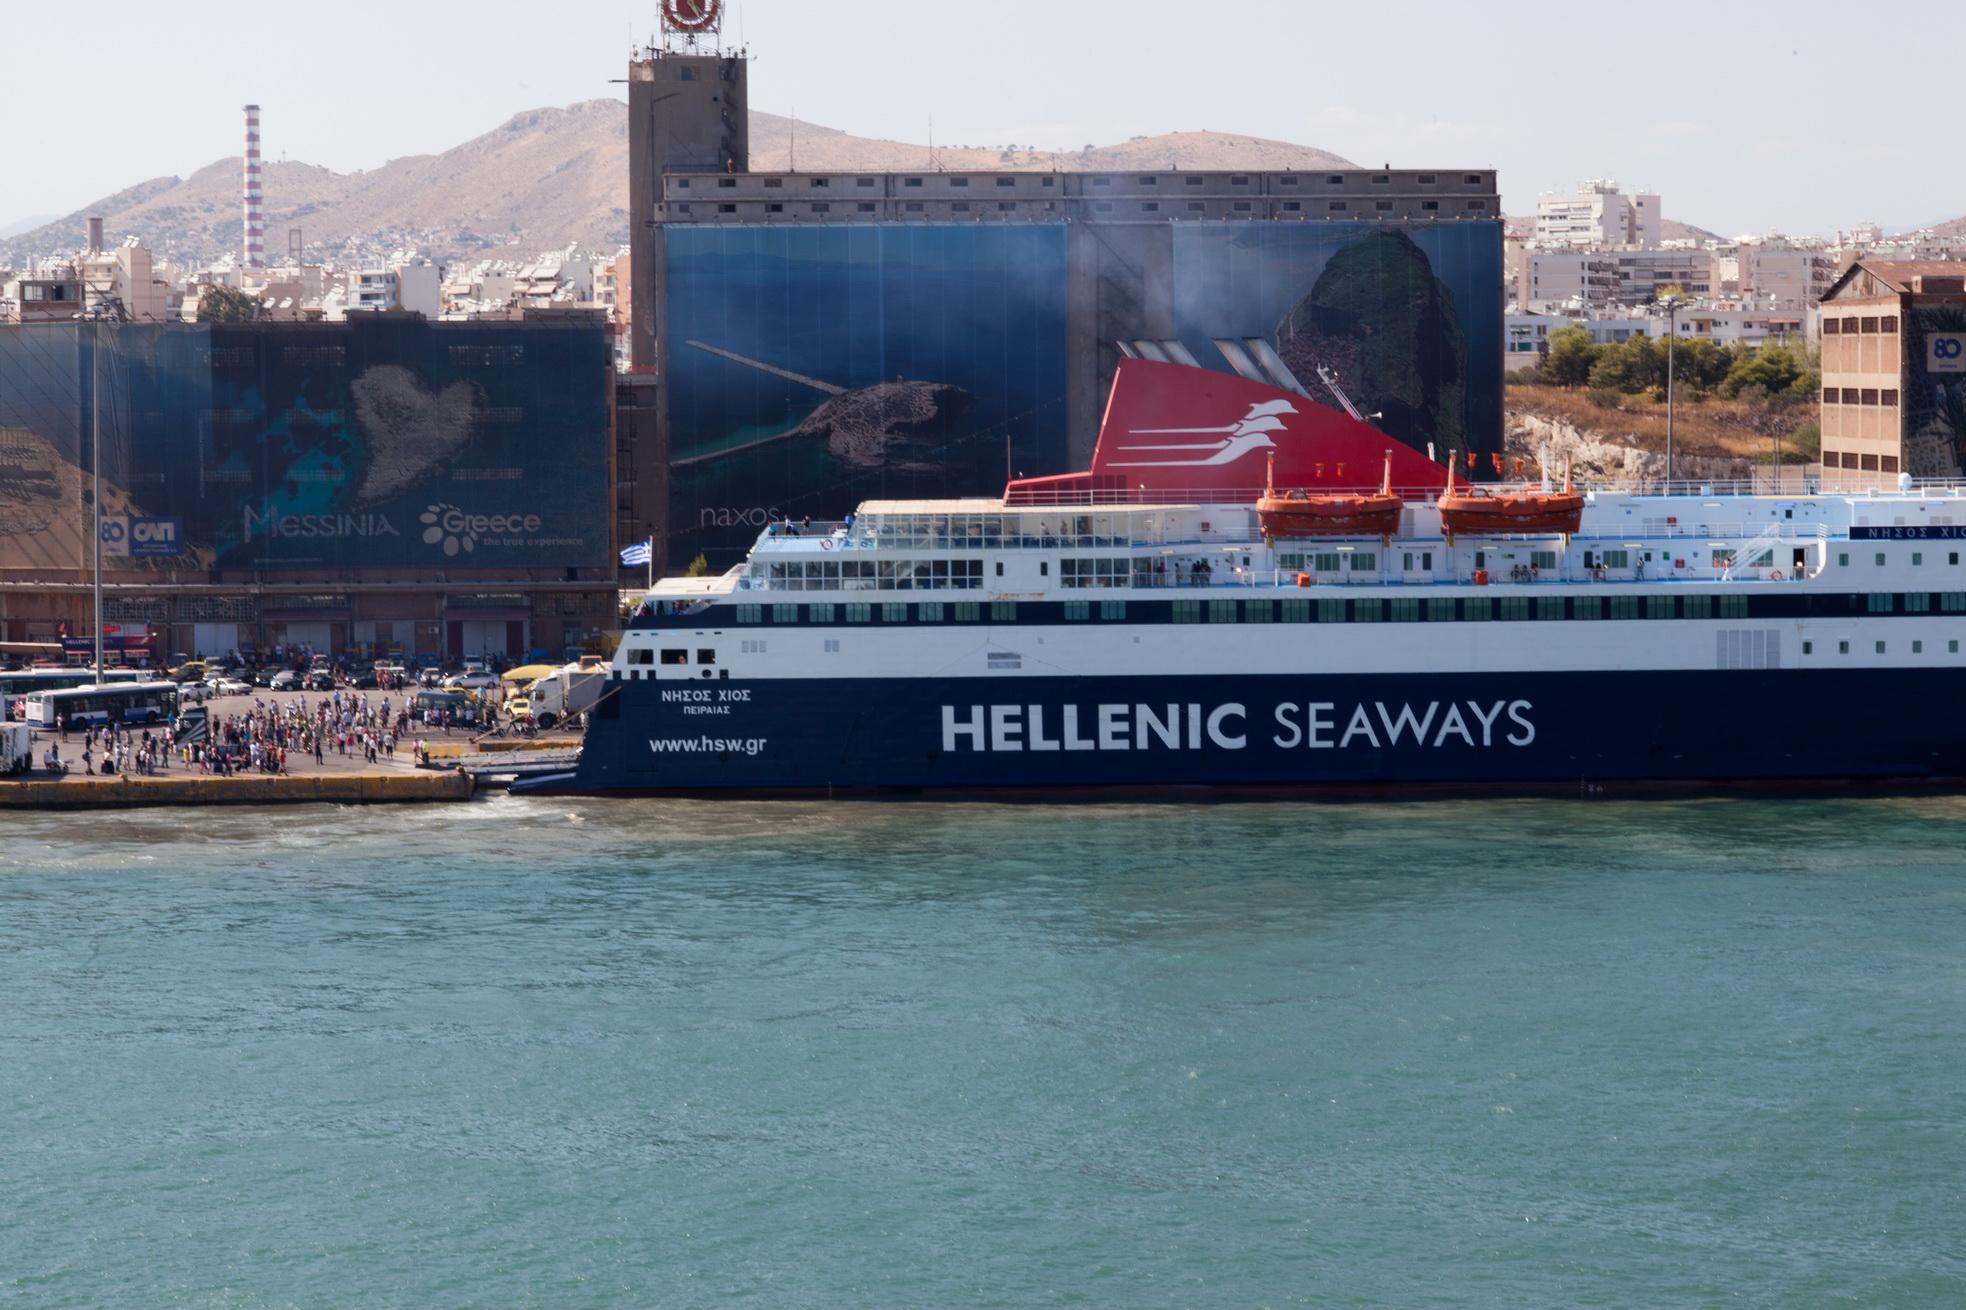 MS Nissos Chios IMO 9215555 Hellenic Seaways docked Piraeus Port of Athens Greece 01